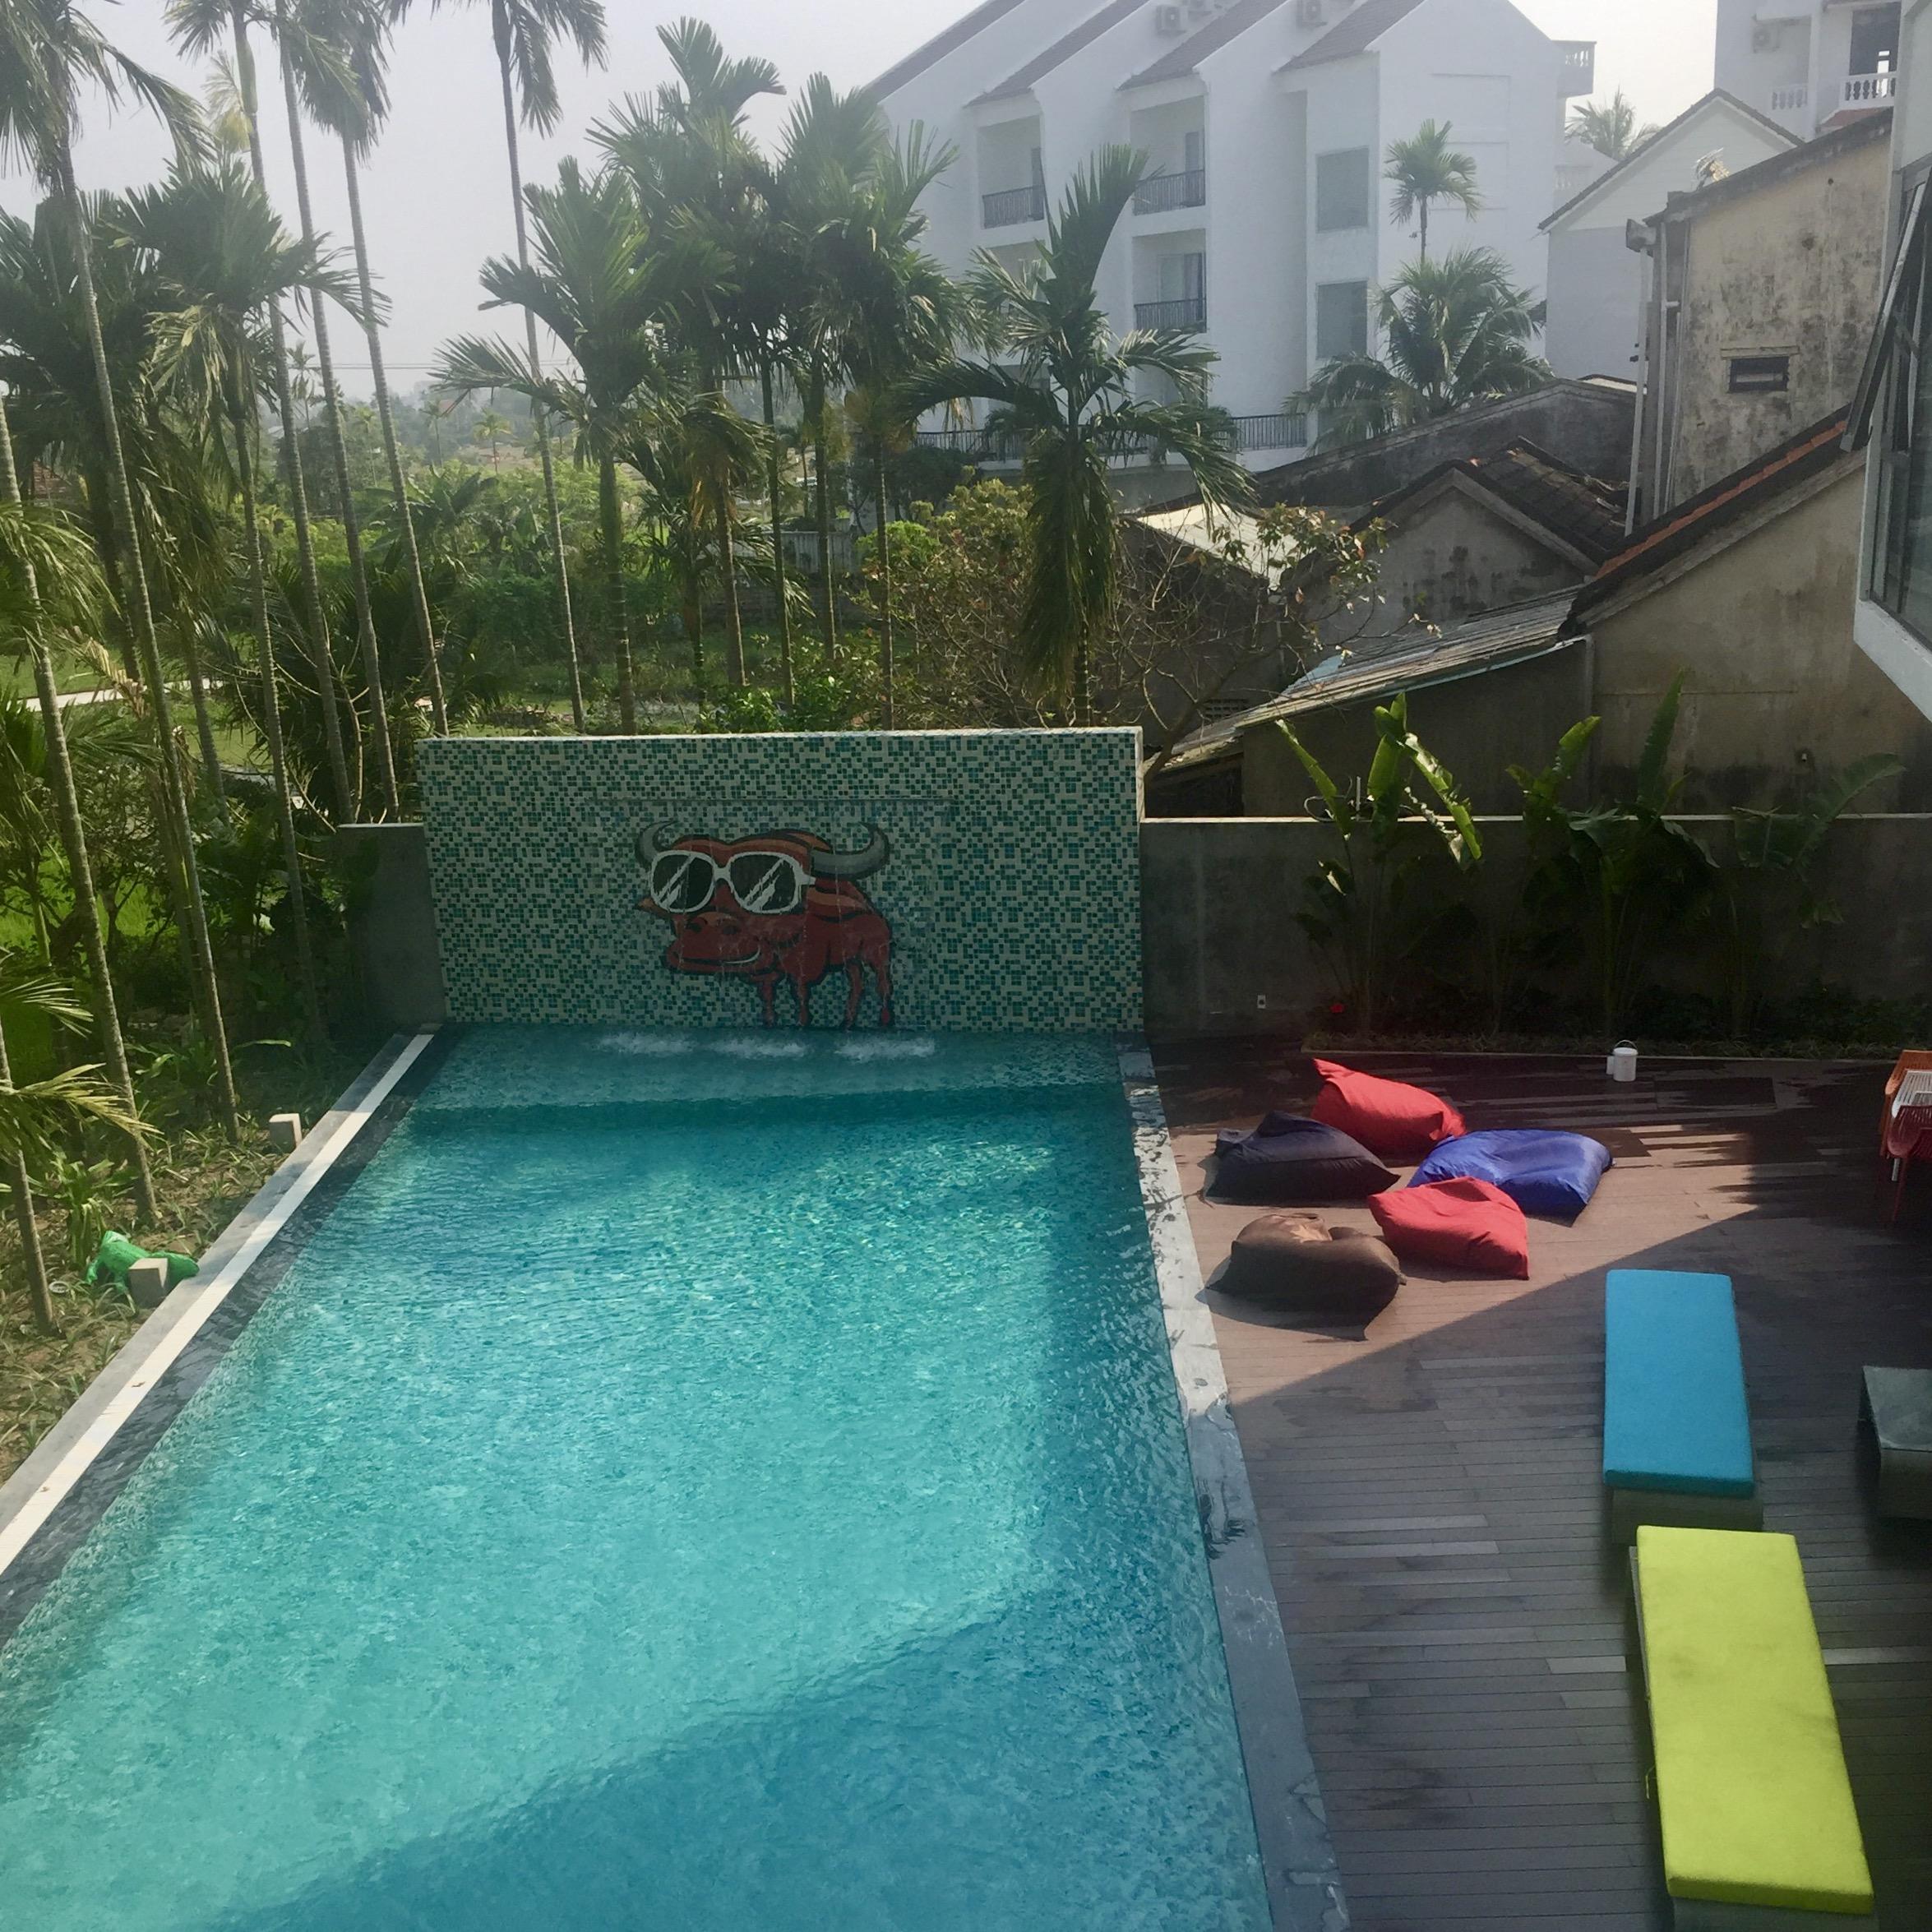 Vietnam Backpackers Hostel Hoi An | HallAroundtheWorld